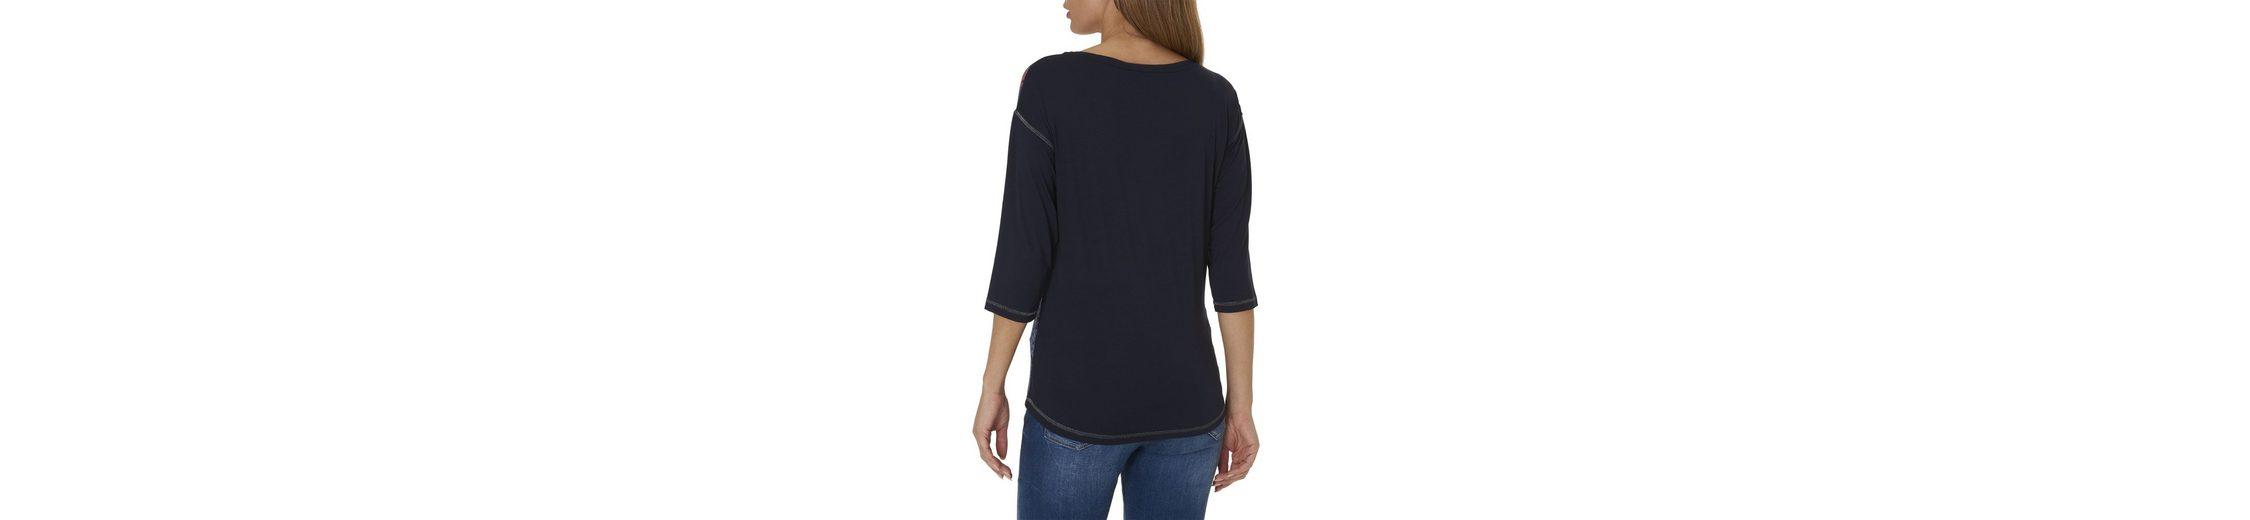 mit platziertem Shirt buntem Betty Front Print Front Shirt Betty Print platziertem Barclay Barclay Betty Barclay buntem Shirt mit wwSxRqA0HW